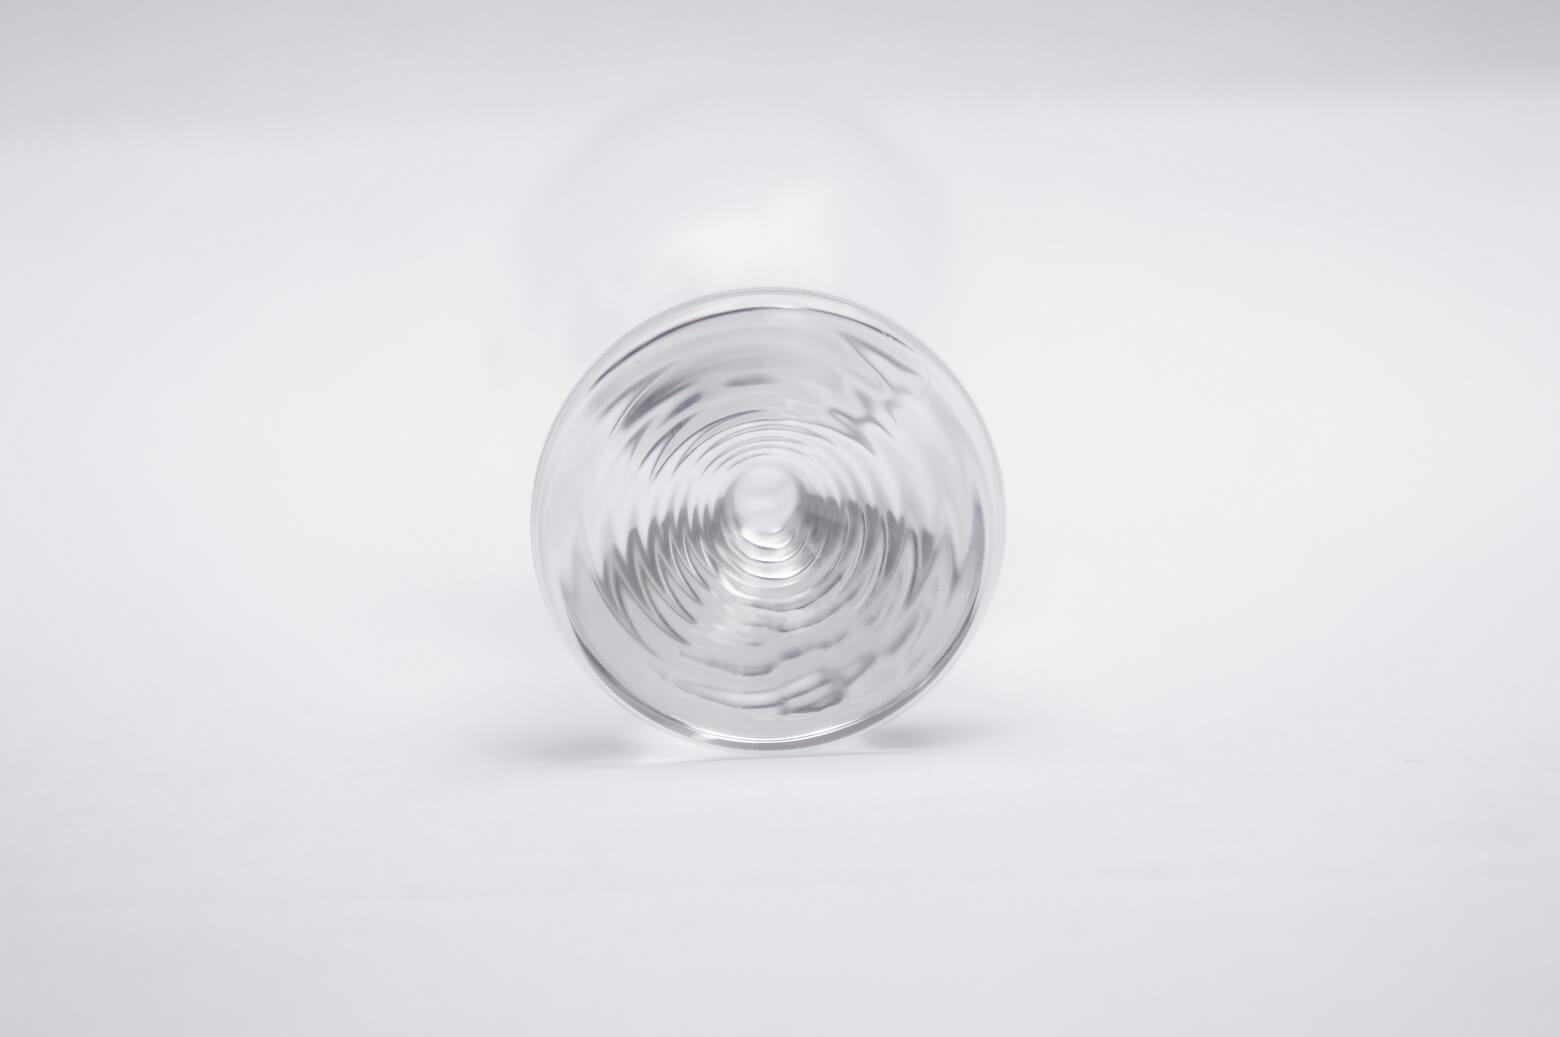 iittala Tapio Wirkkala Cordial Glass/イッタラ タピオ・ウィルカラ コーディアル ショット グラス 北欧食器 フィンランド 5